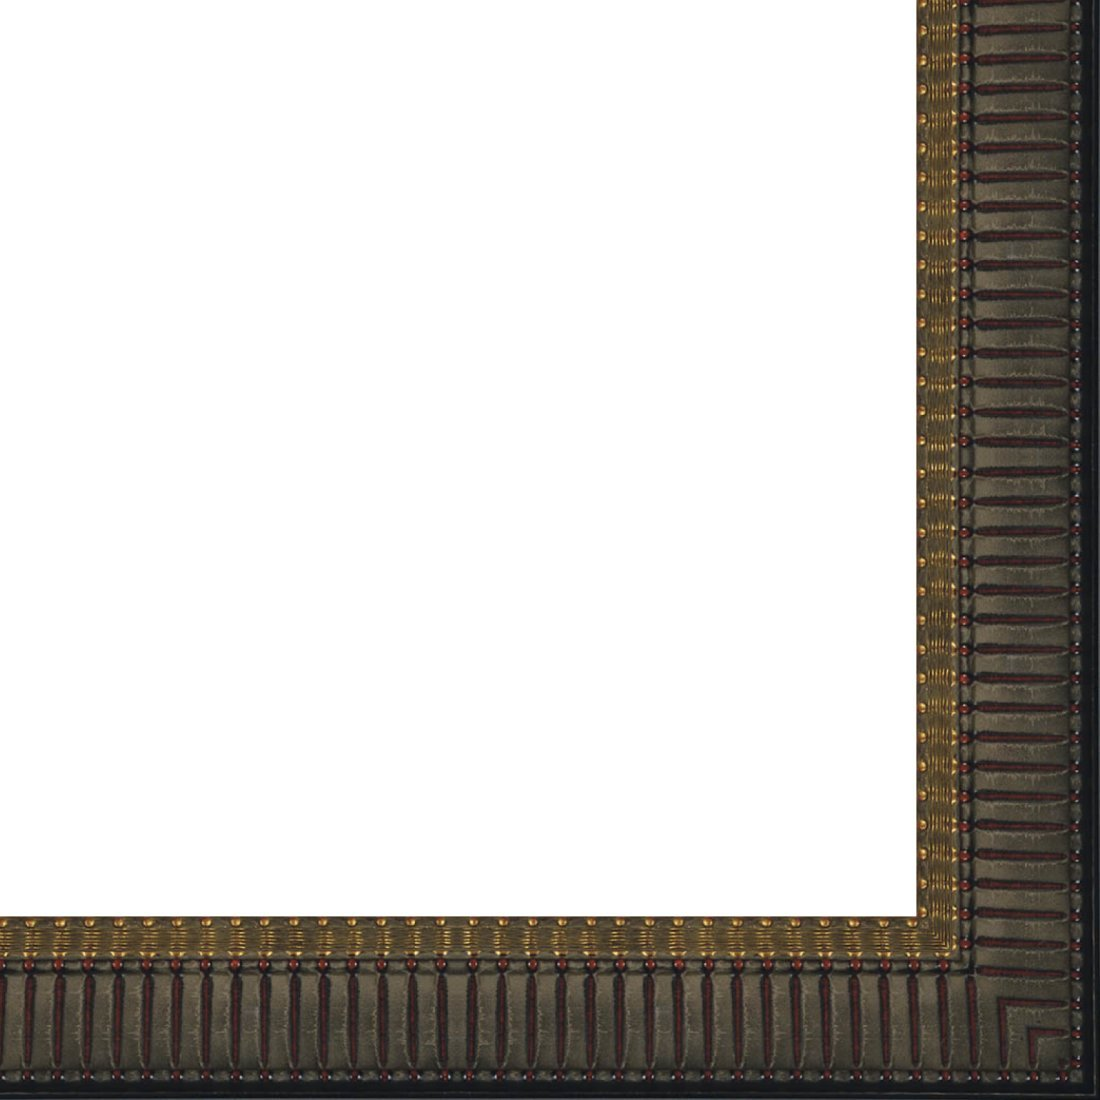 Picture Frame Moulding (Wood) 18ft bundle - Traditional Mahogany Finish - 2.5'' width - 1/2'' rabbet depth